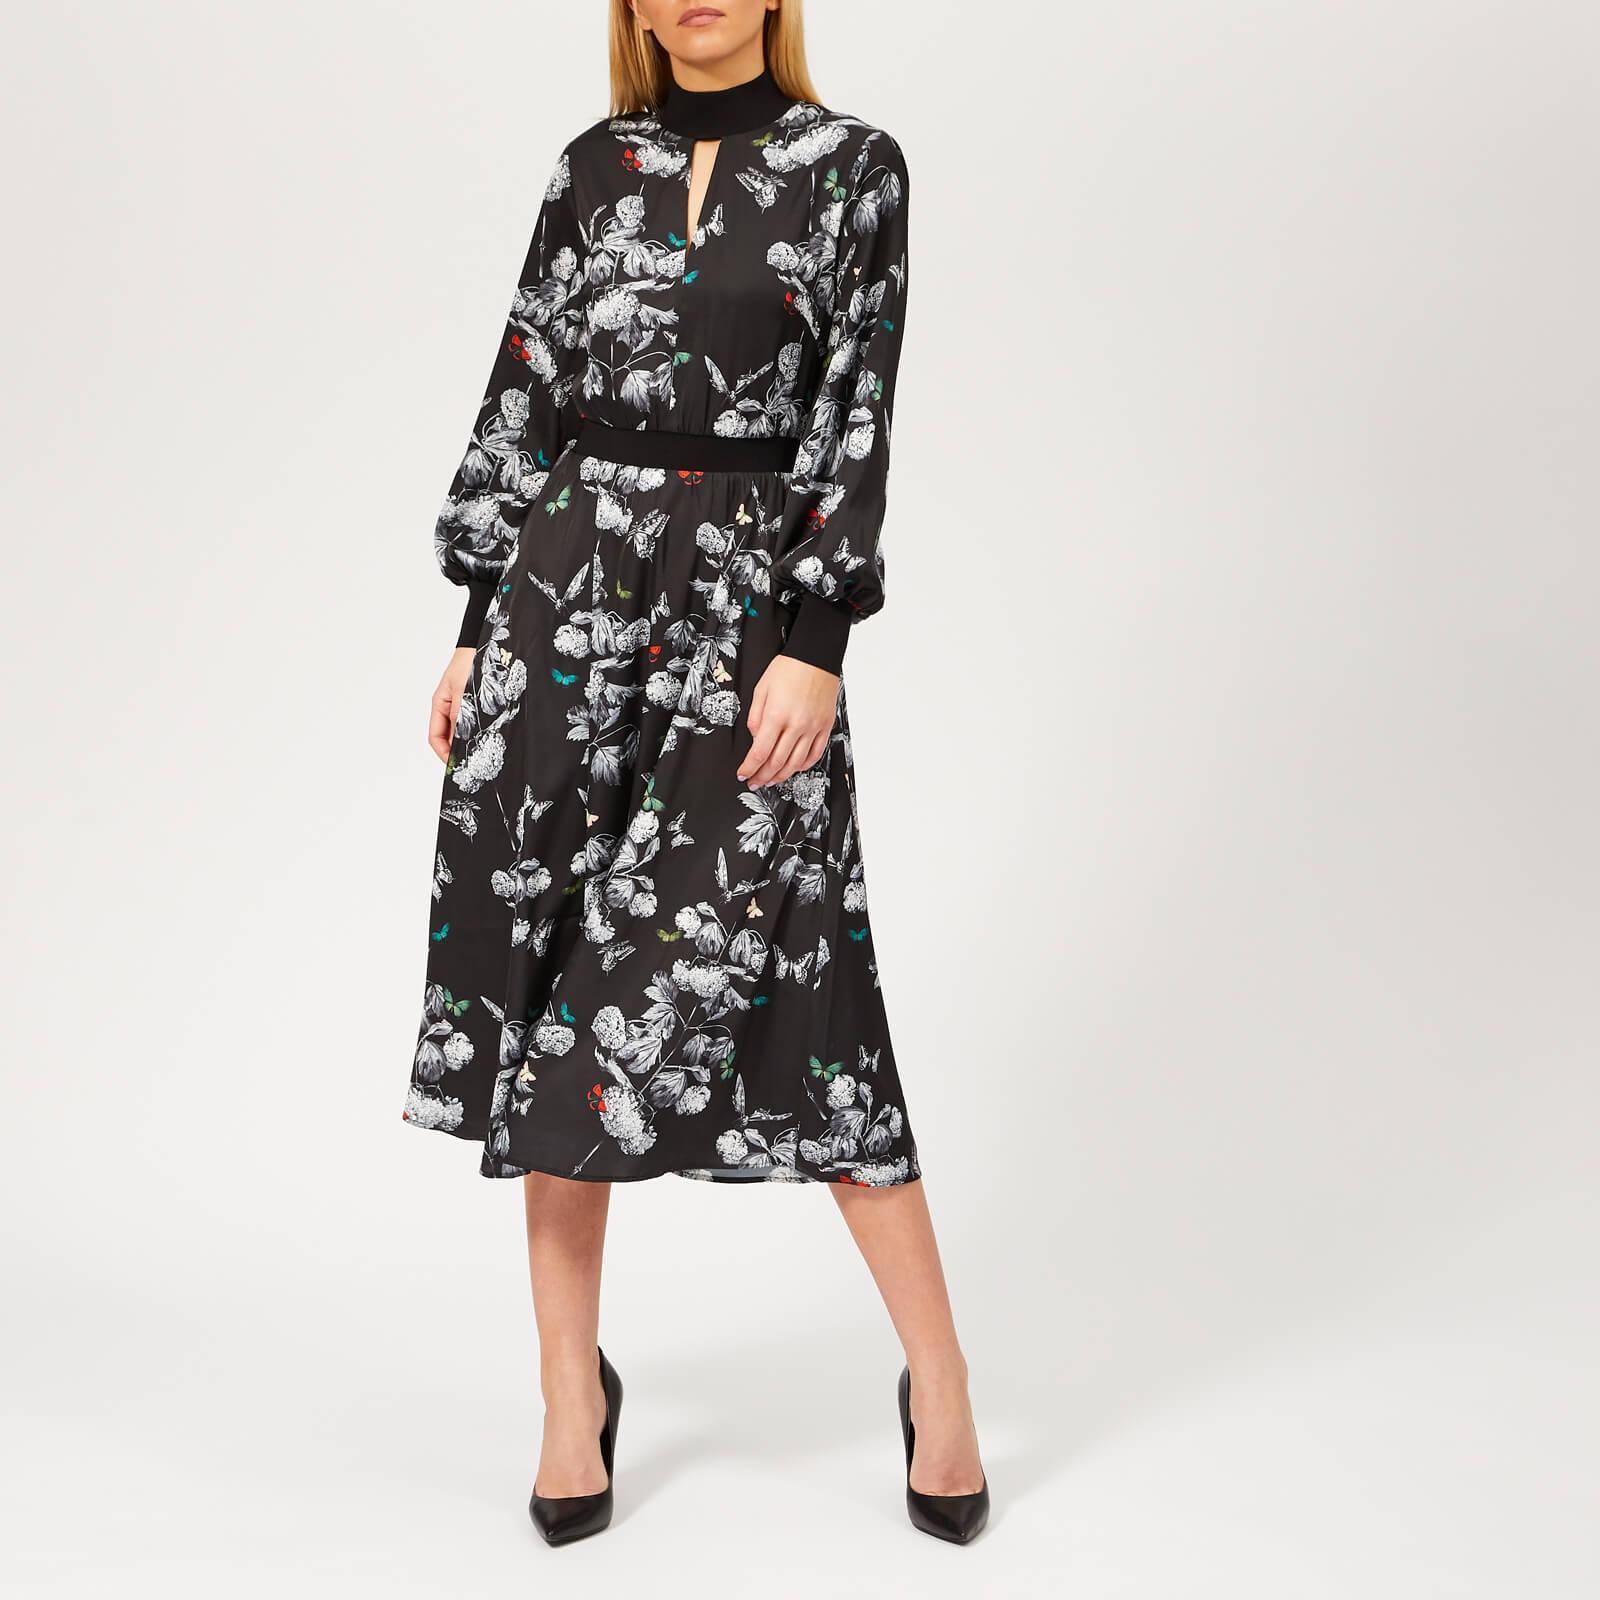 7a9d888b Ted Baker Eynah Narrnia Midi Dress in Black - Lyst